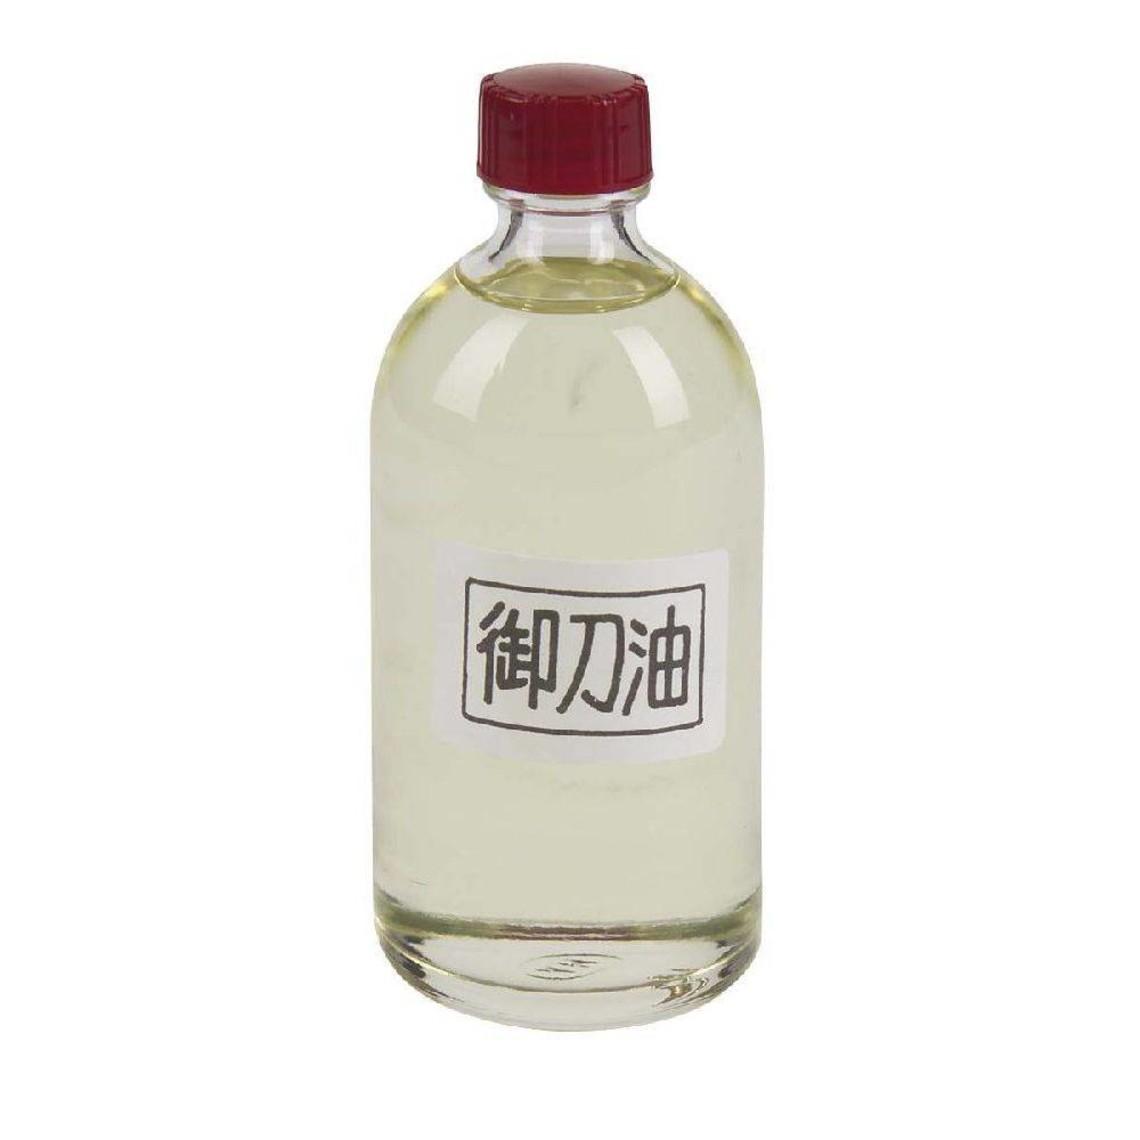 Huile de girofle 100 ml